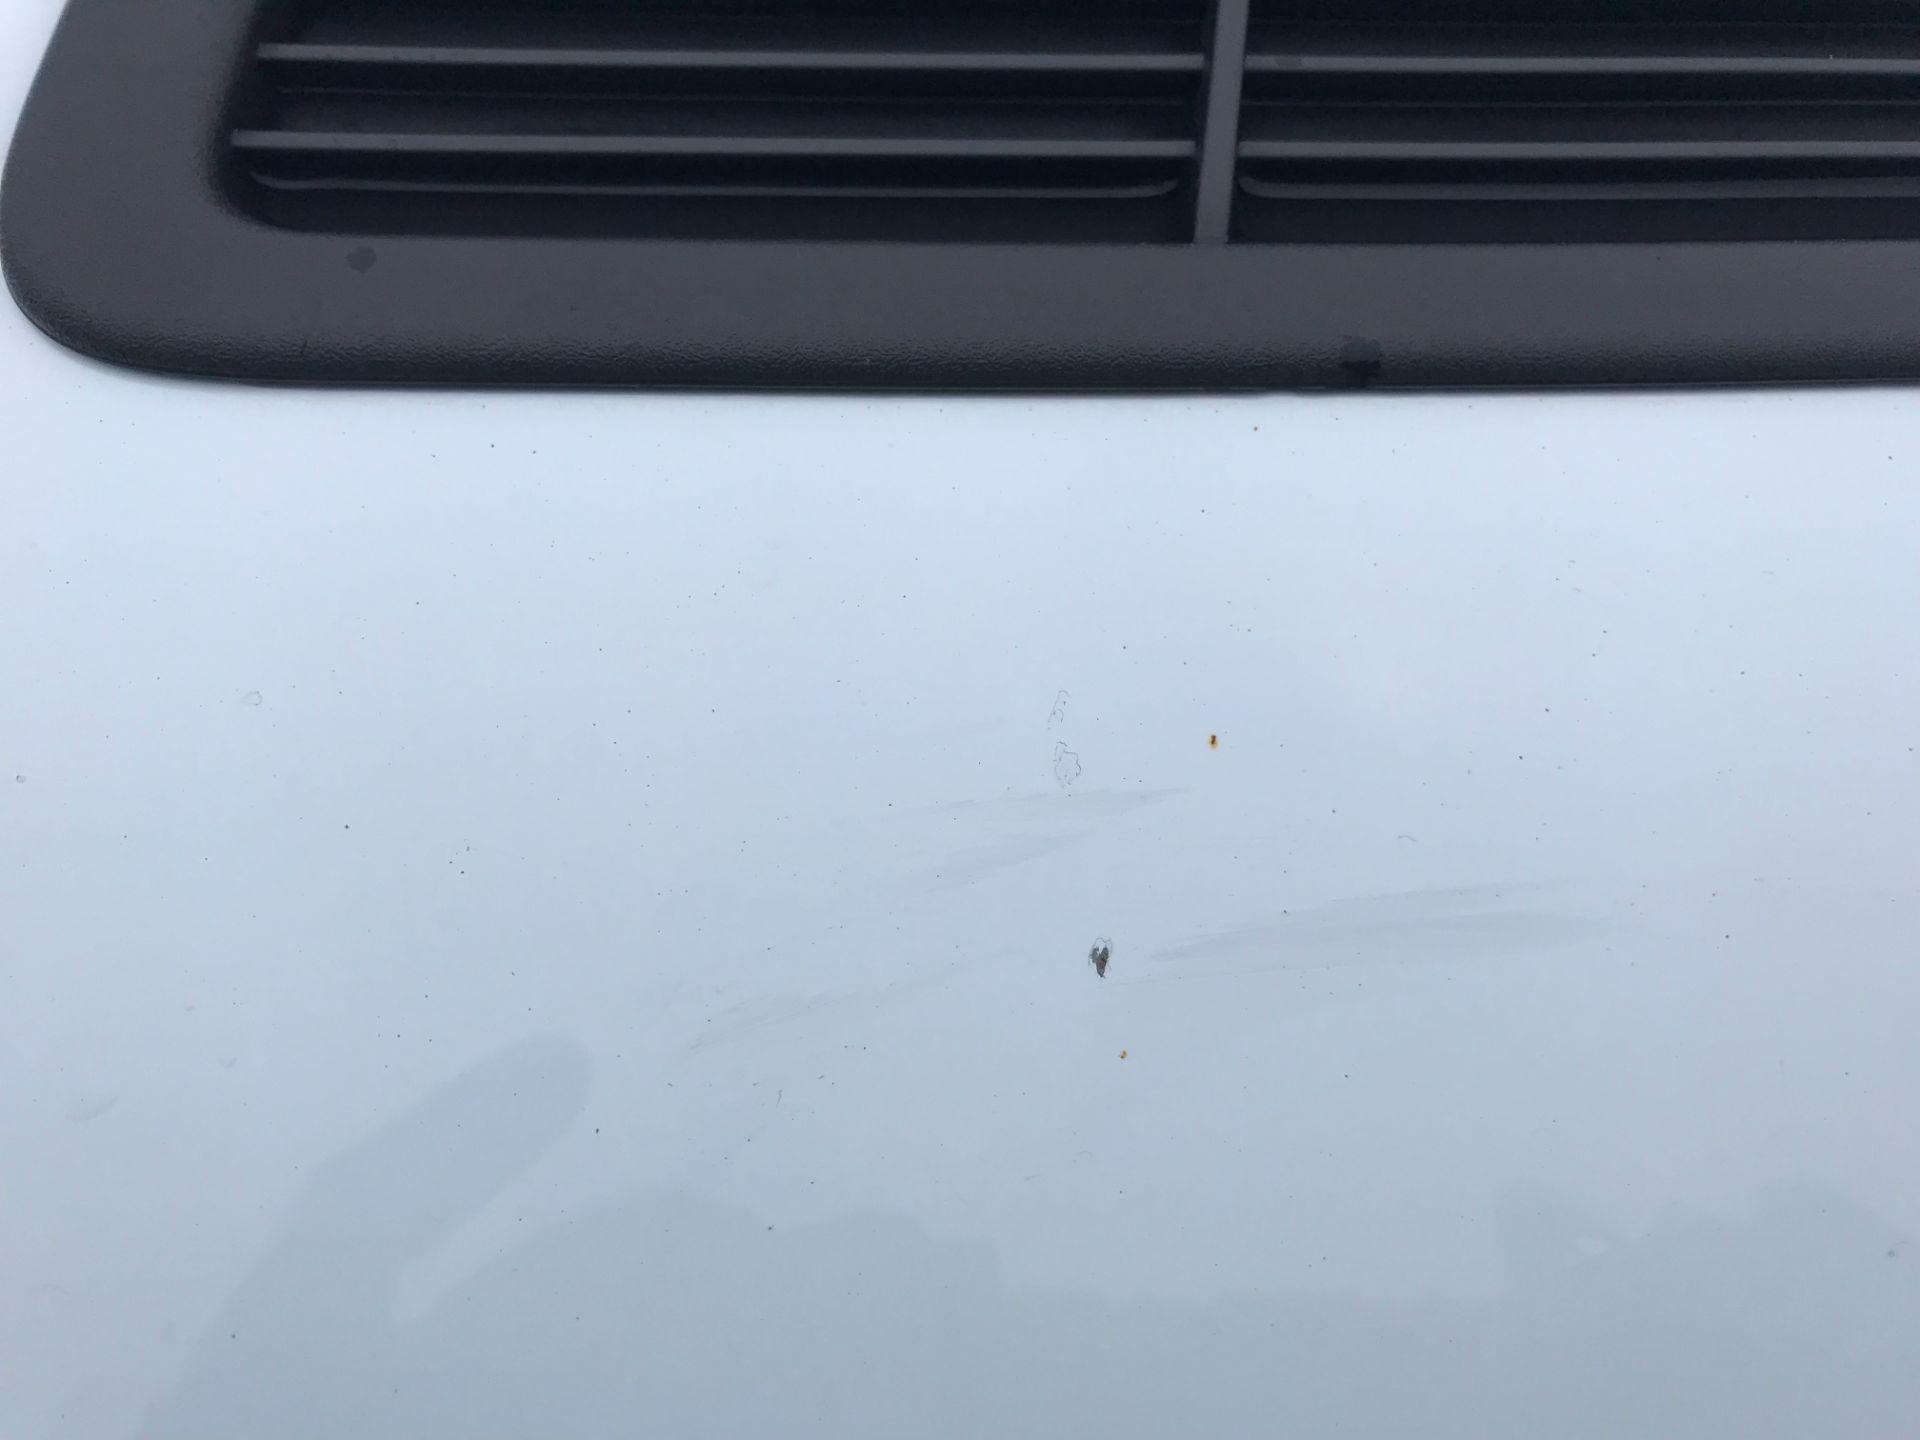 2018 Ford Transit 2.0 Tdci 130 L2 H2 EURO 6 (FG18YJM) Image 43